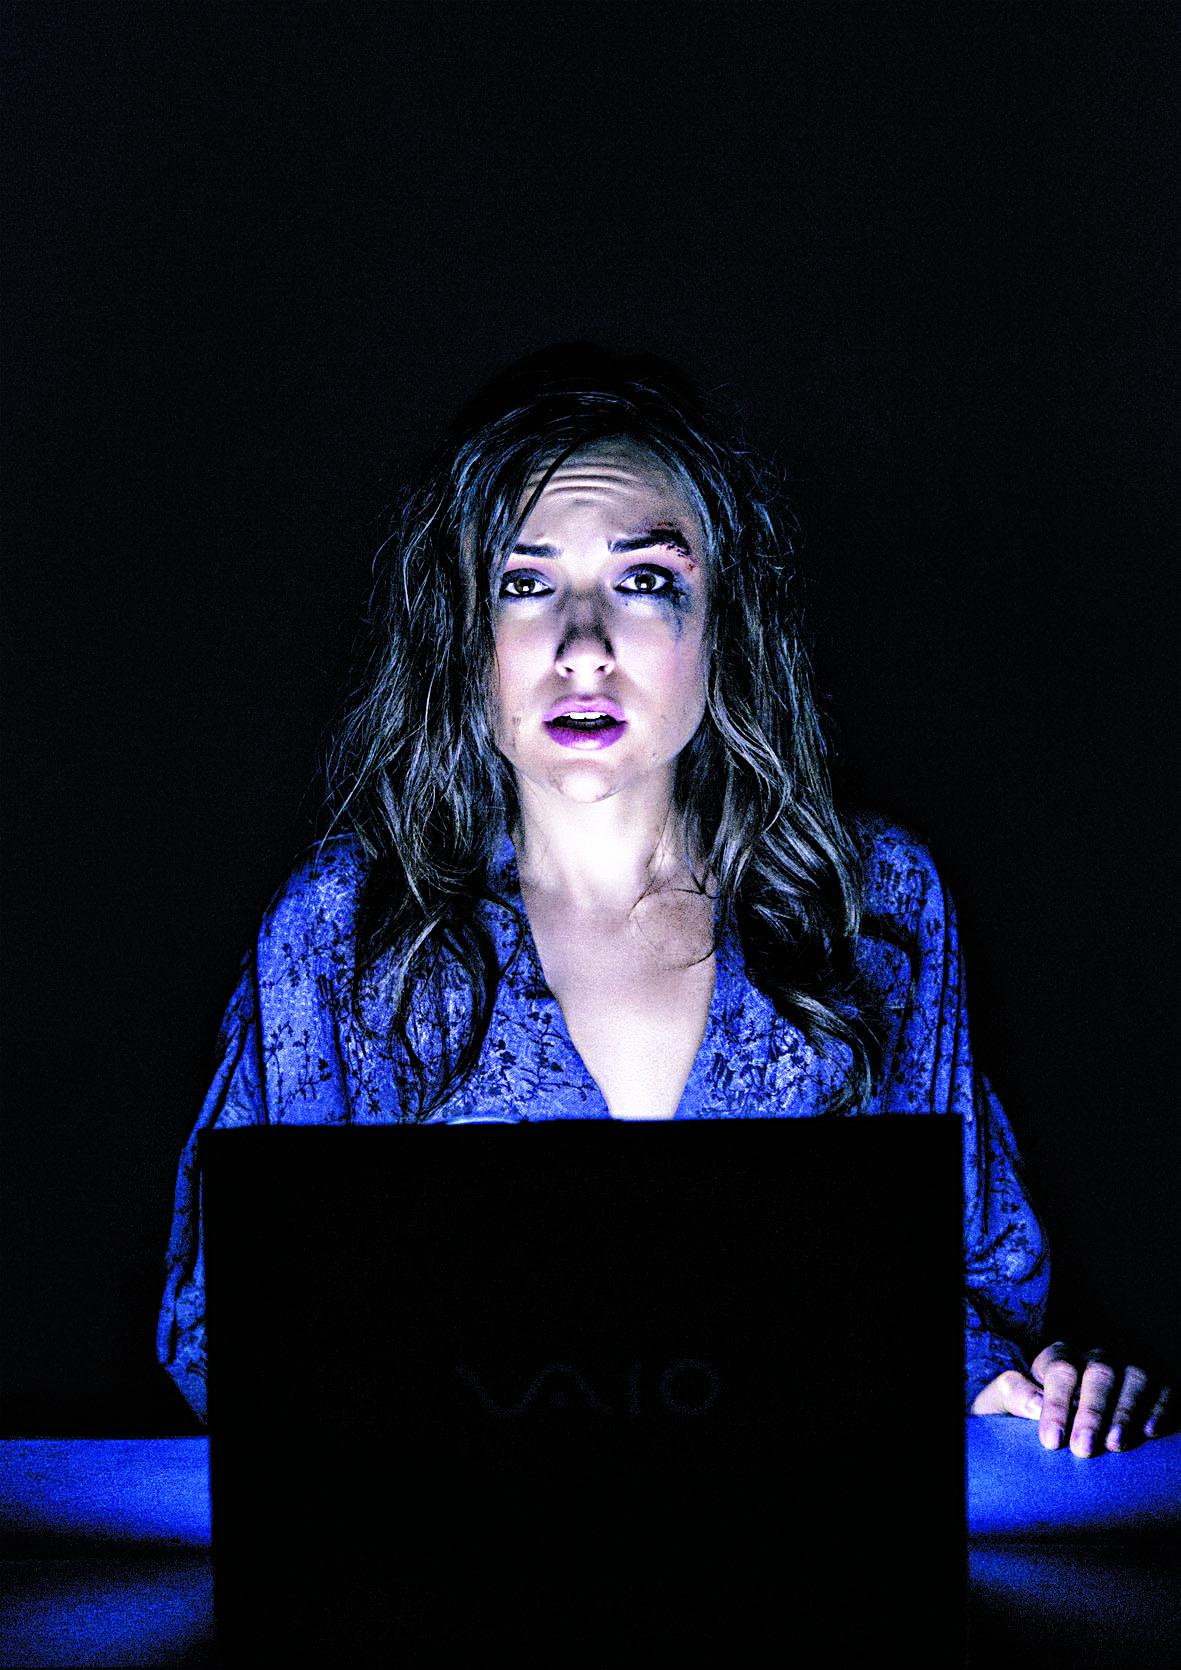 Porno dans windows media